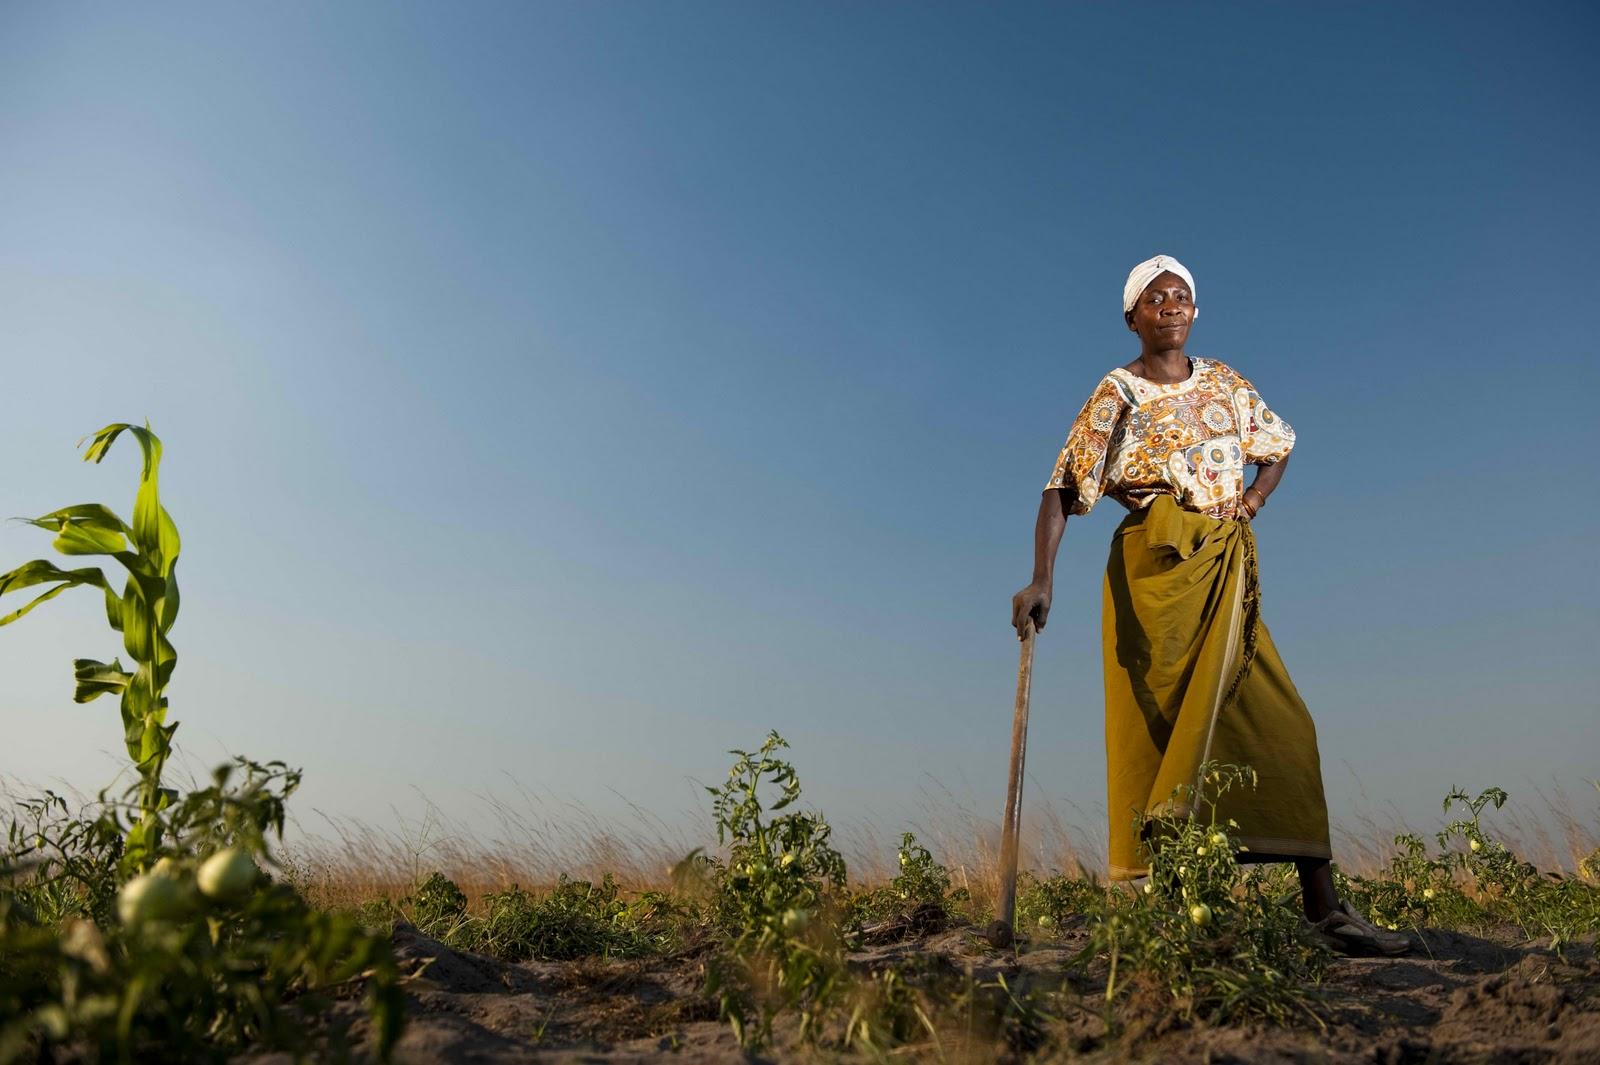 women empowerment through microfinance services Microfinance and the empowerment of women as well as services that reduce women's development when empowered through microfinance.